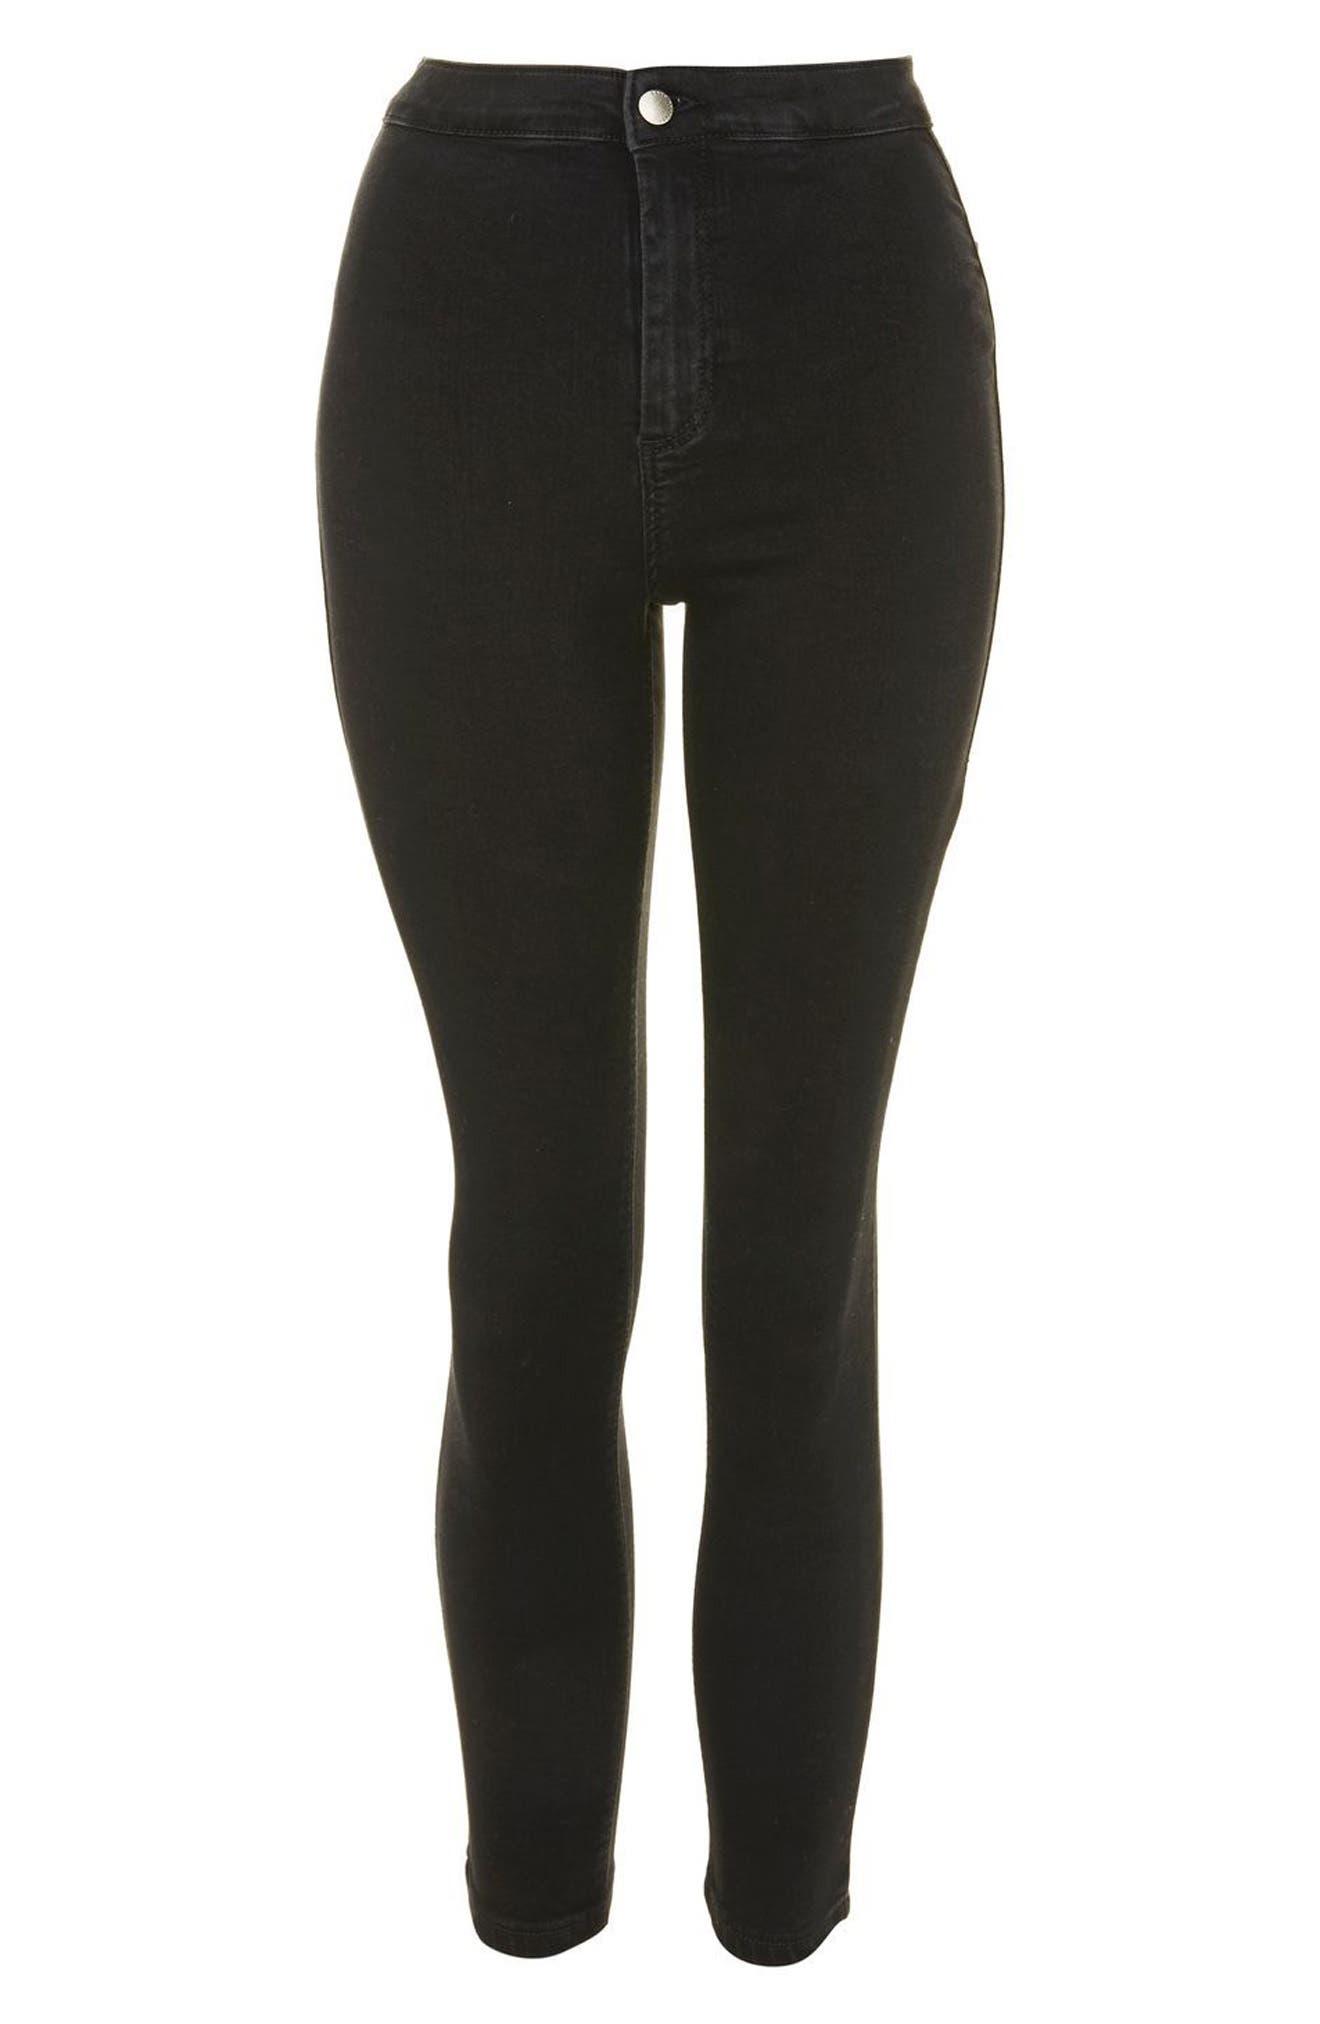 Alternate Image 3  - Topshop Joni High Waist Crop Skinny Jeans (Petite)